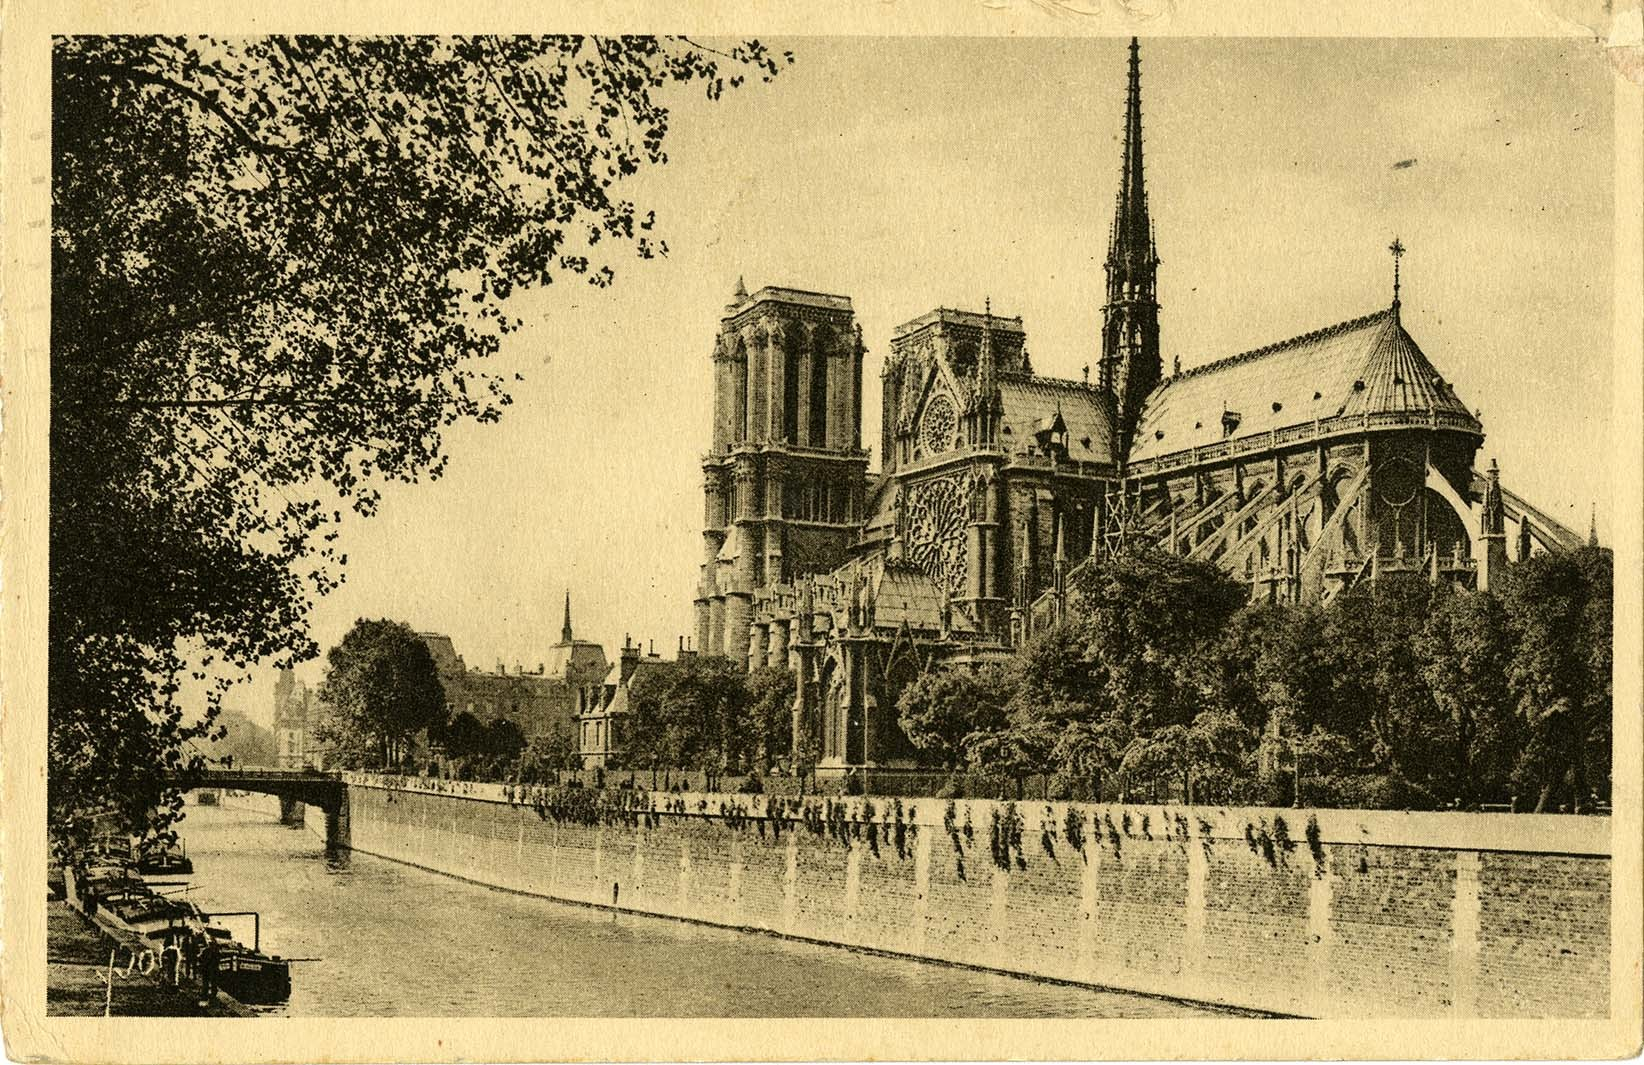 Ms2011_004_AndersonPostcard_AndersonToDickson_postcard_1939a.jpg